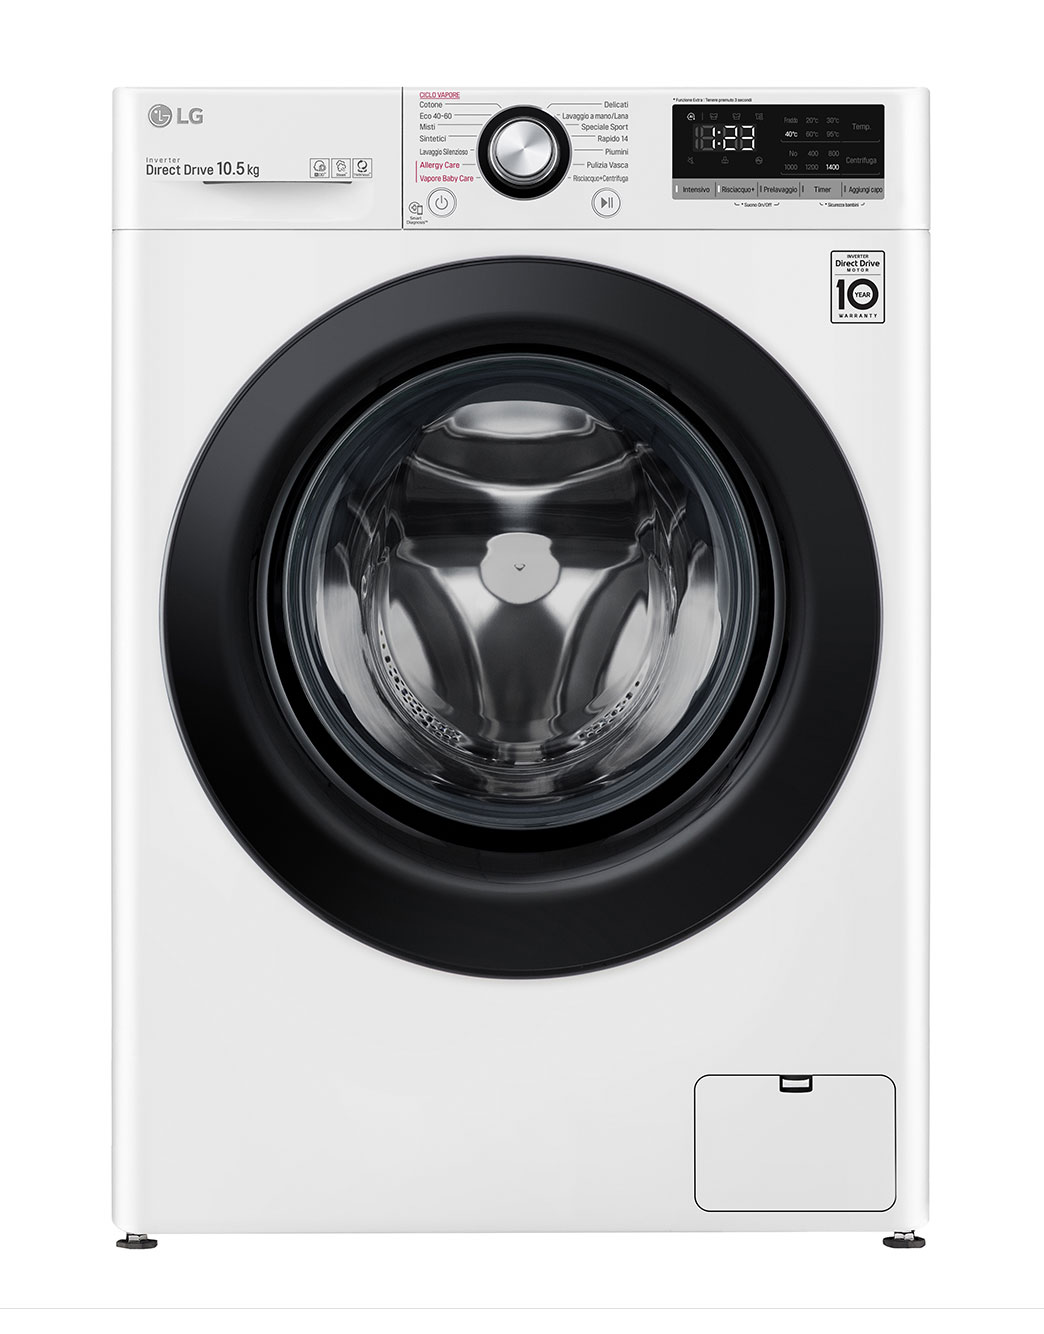 LG F4WV310S6E Lavatrice Intelligente AIDD 10,5kg Vapore 1400 Giri/min Carica frontale Classe B